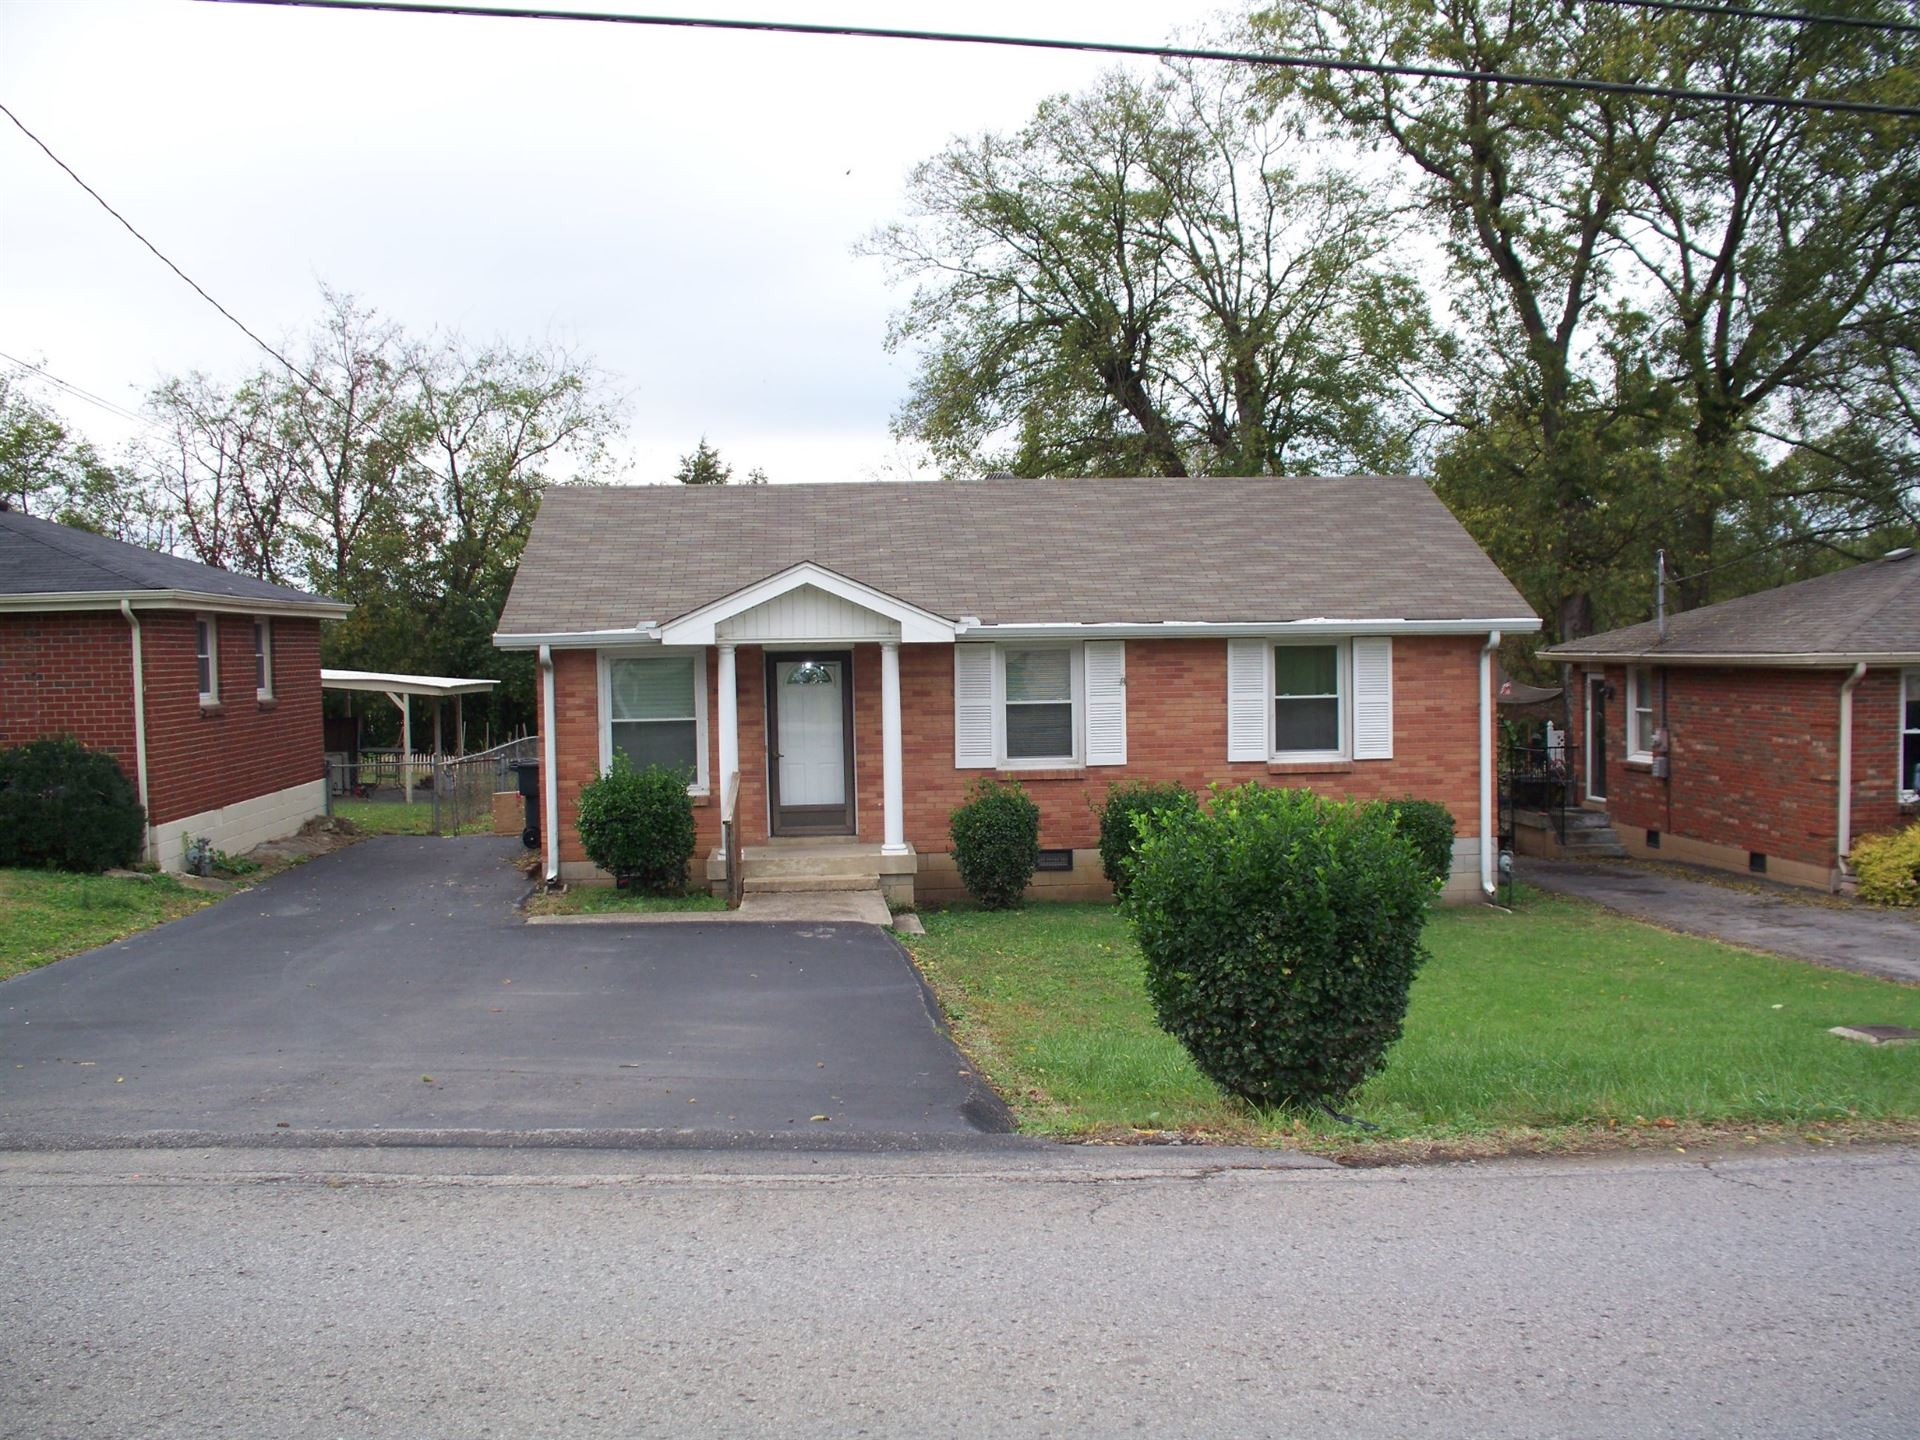 673 Westboro Dr, Nashville, TN 37209 - MLS#: 2201967